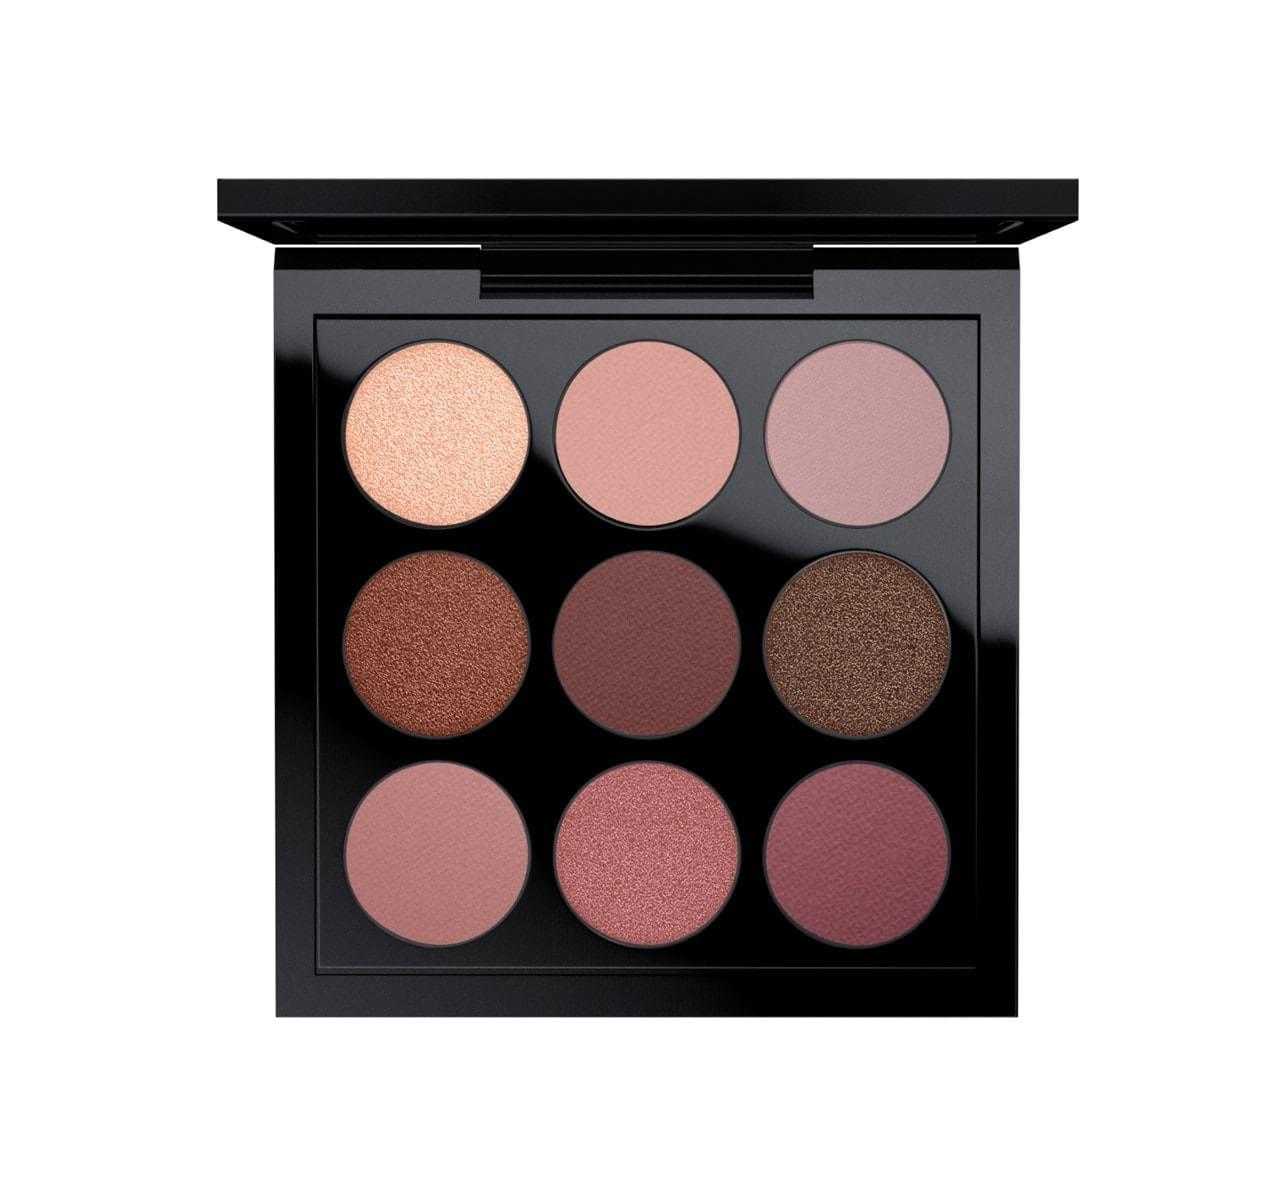 how to get a job at mac cosmetics uk